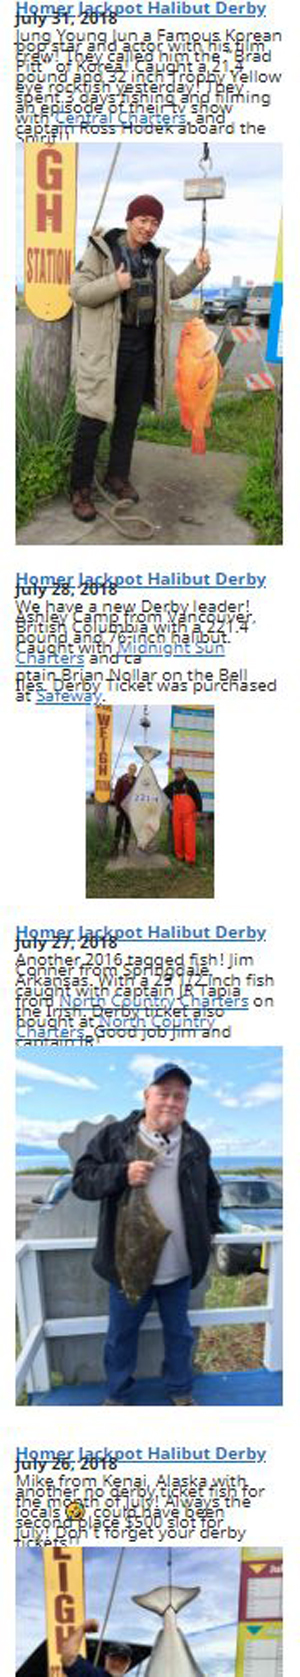 HomerJackpotHalibutDerby_7-31-2.jpg